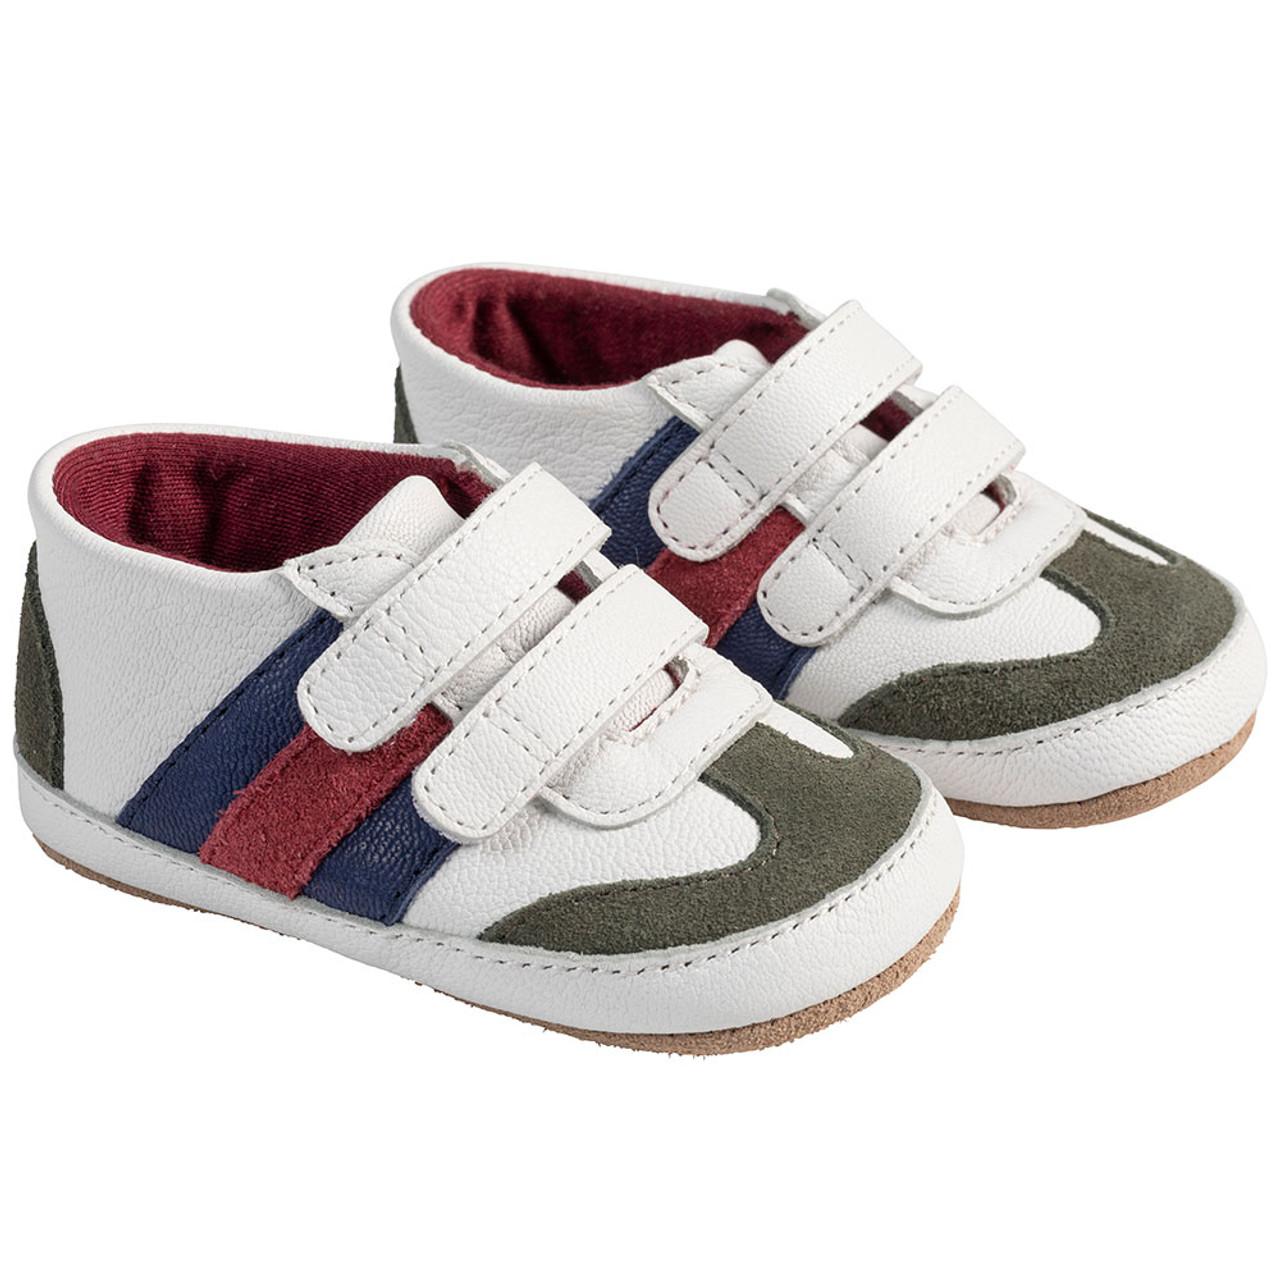 White Jayden | First Kicks | Baby Shoes